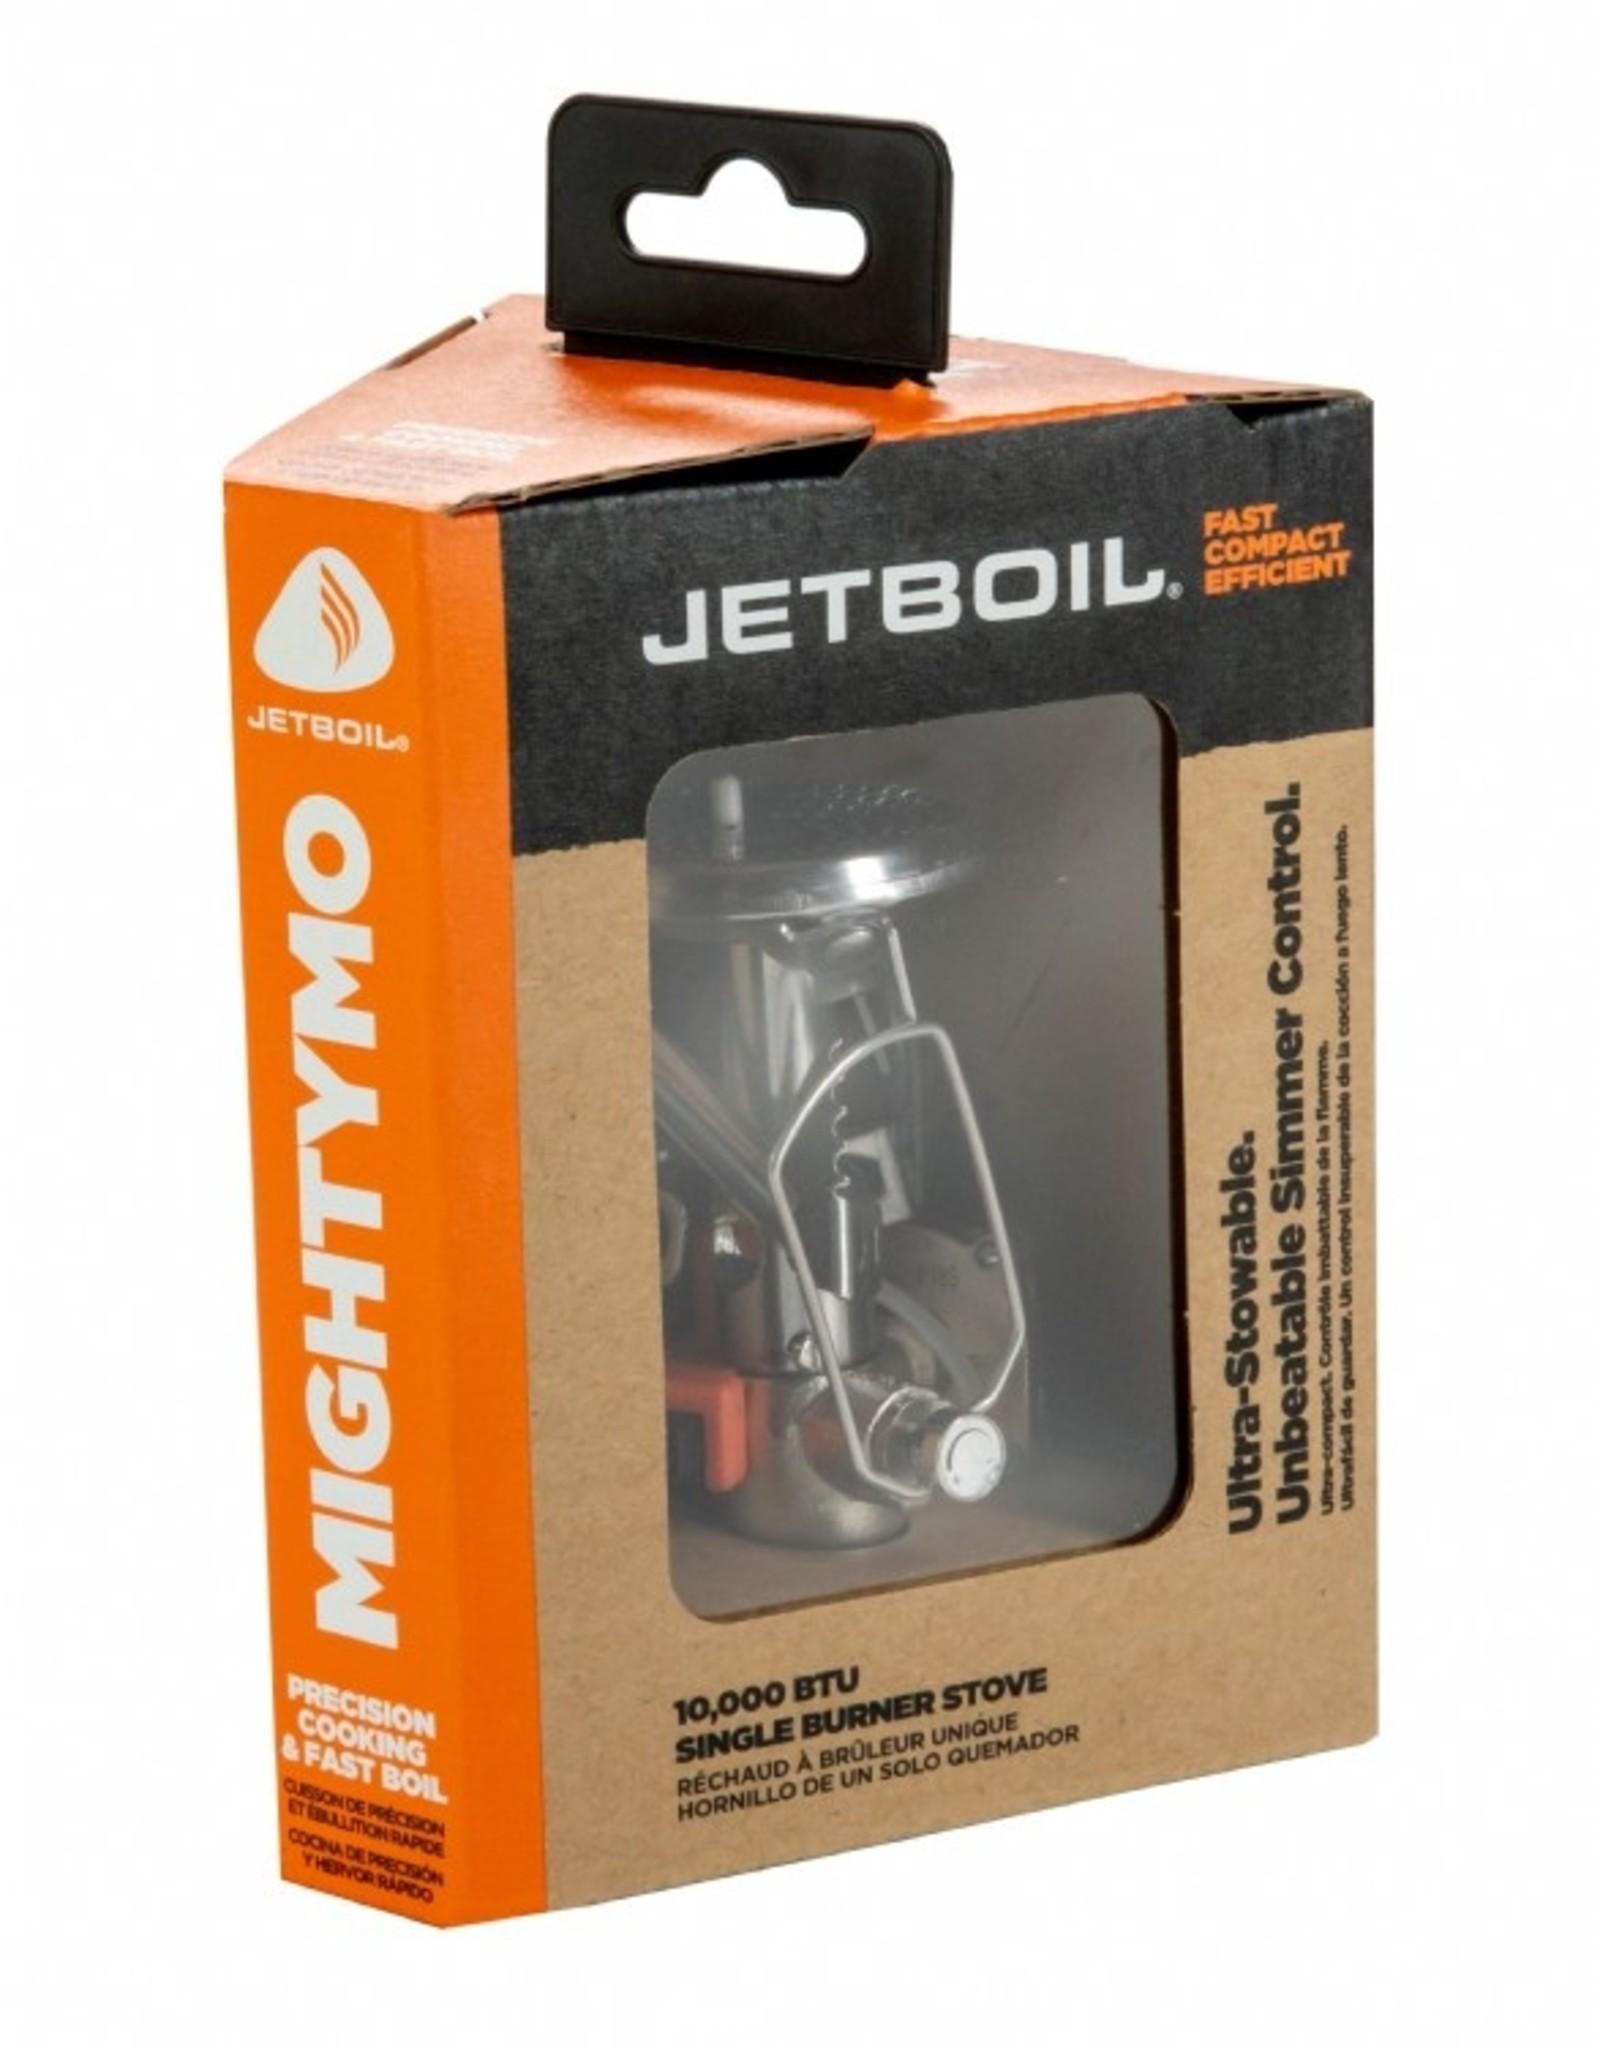 Jetboil Jetboil Mightymo gasburner